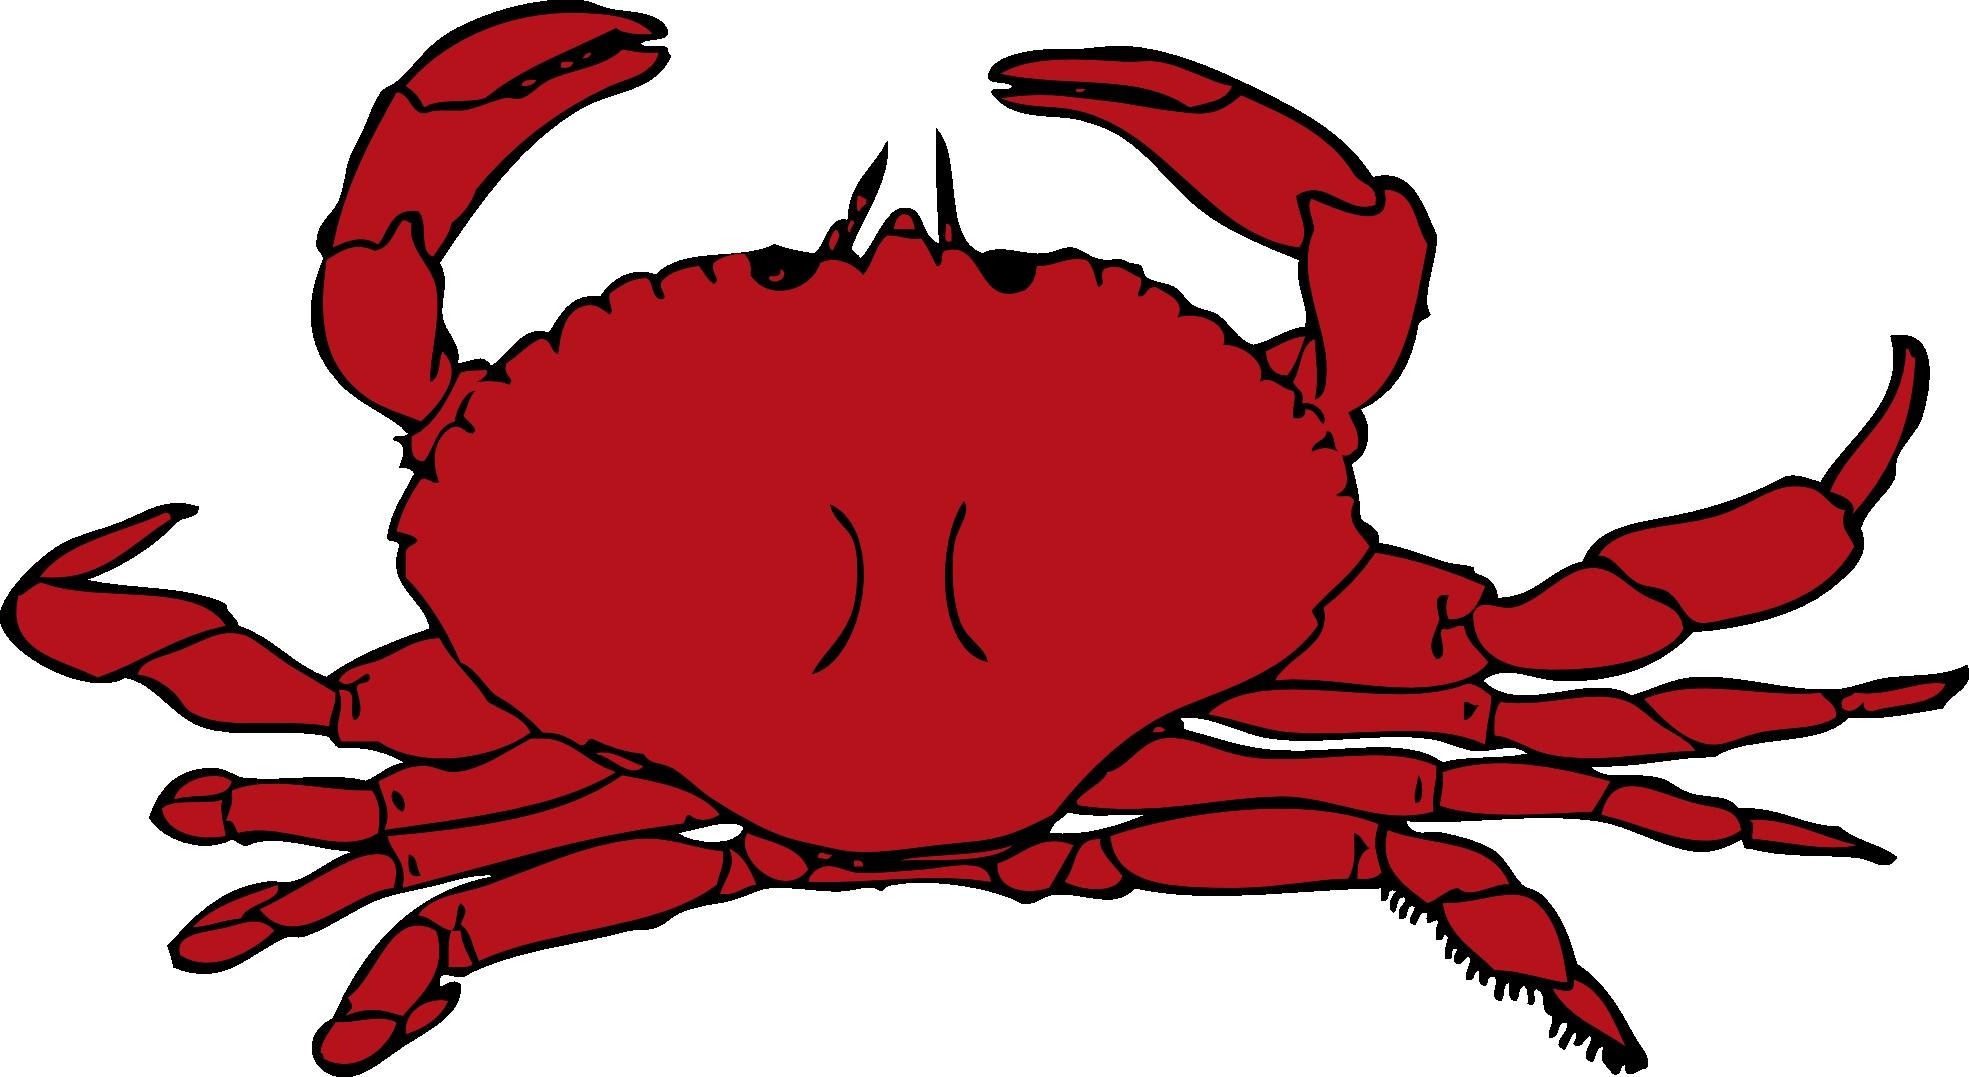 Clipart Sumptuous Crab Clipart Crab Clipart Clipart Spectacular Idea